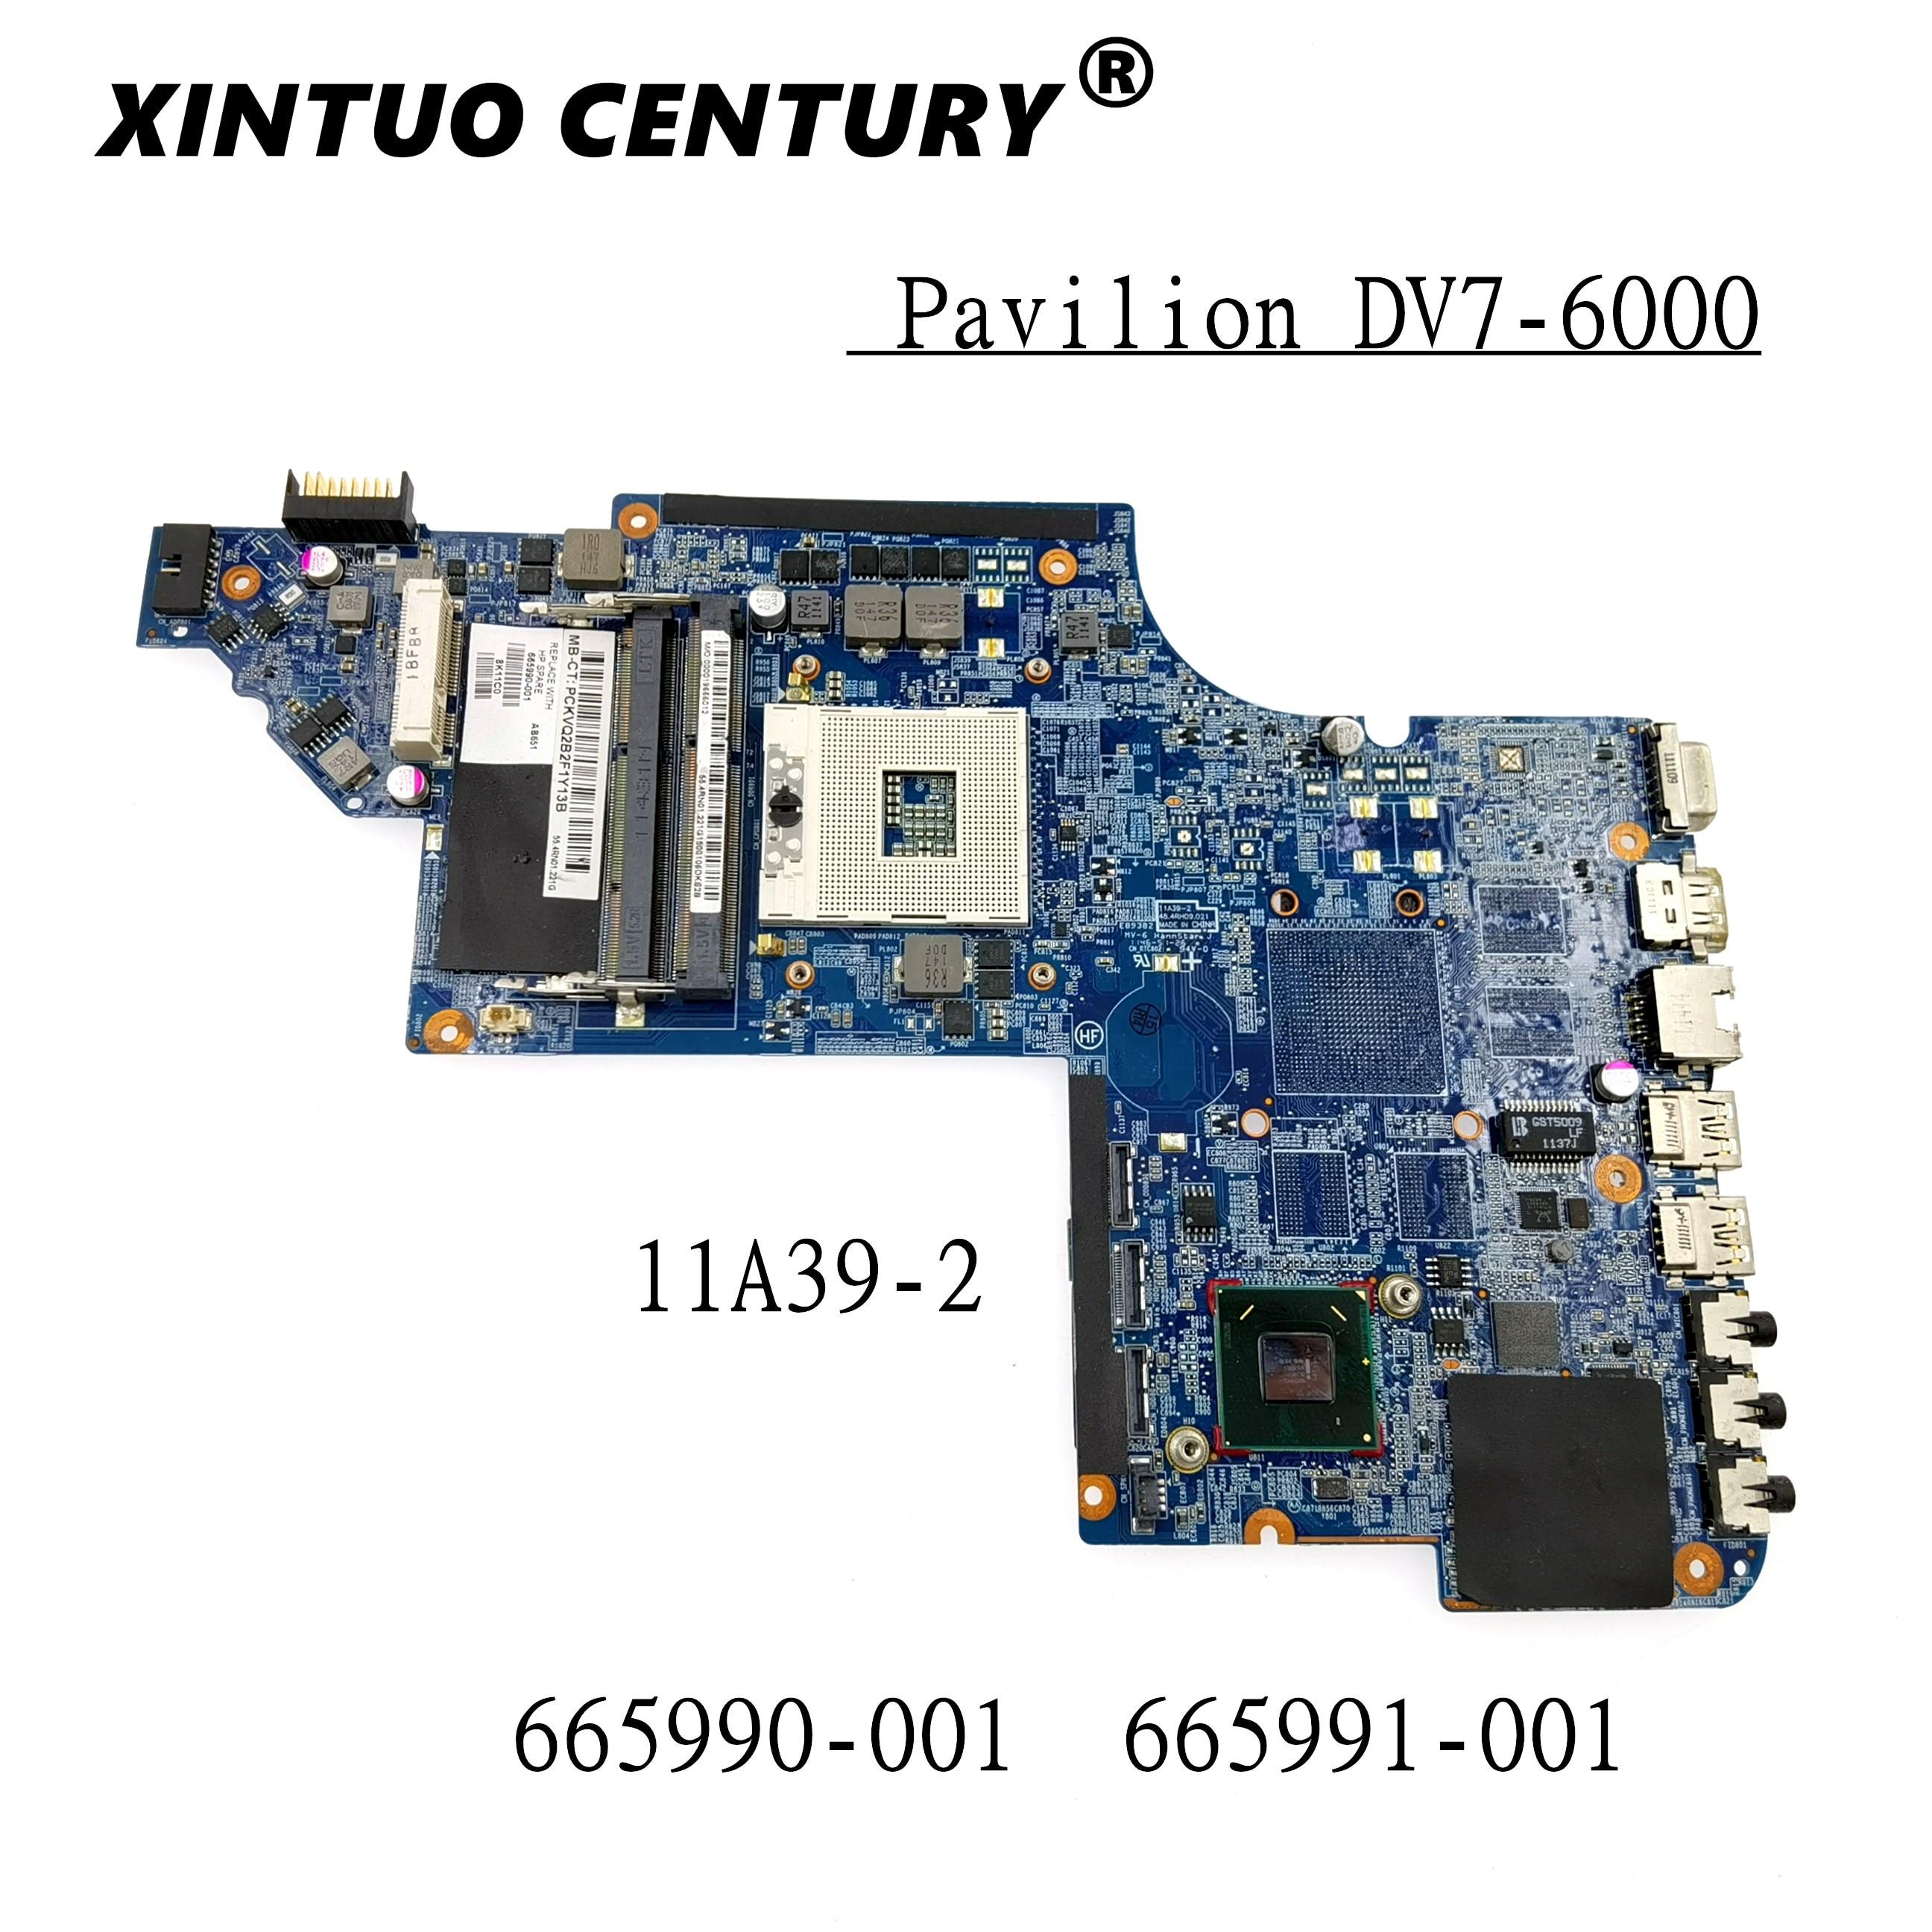 Placa base para ordenador portátil NOKOTION 665991, 639391-001, para HP Pavilion DV7,...